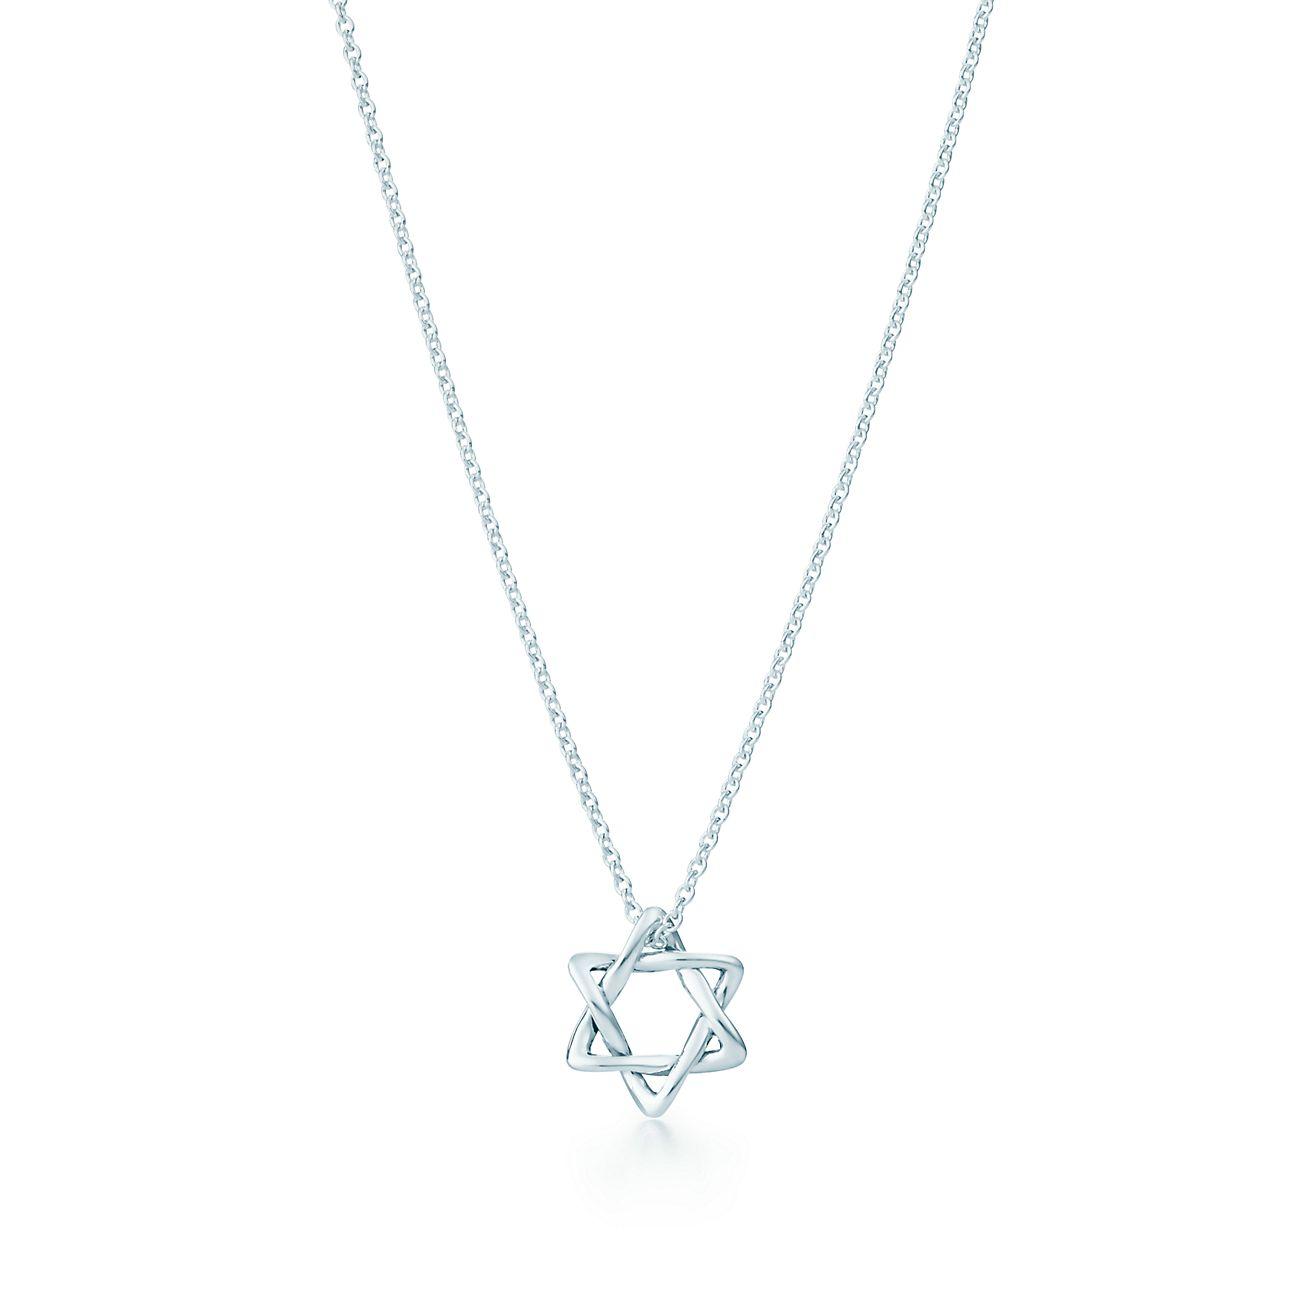 Elsa Peretti Round pendant in sterling silver - Size 24 mm Tiffany & Co.